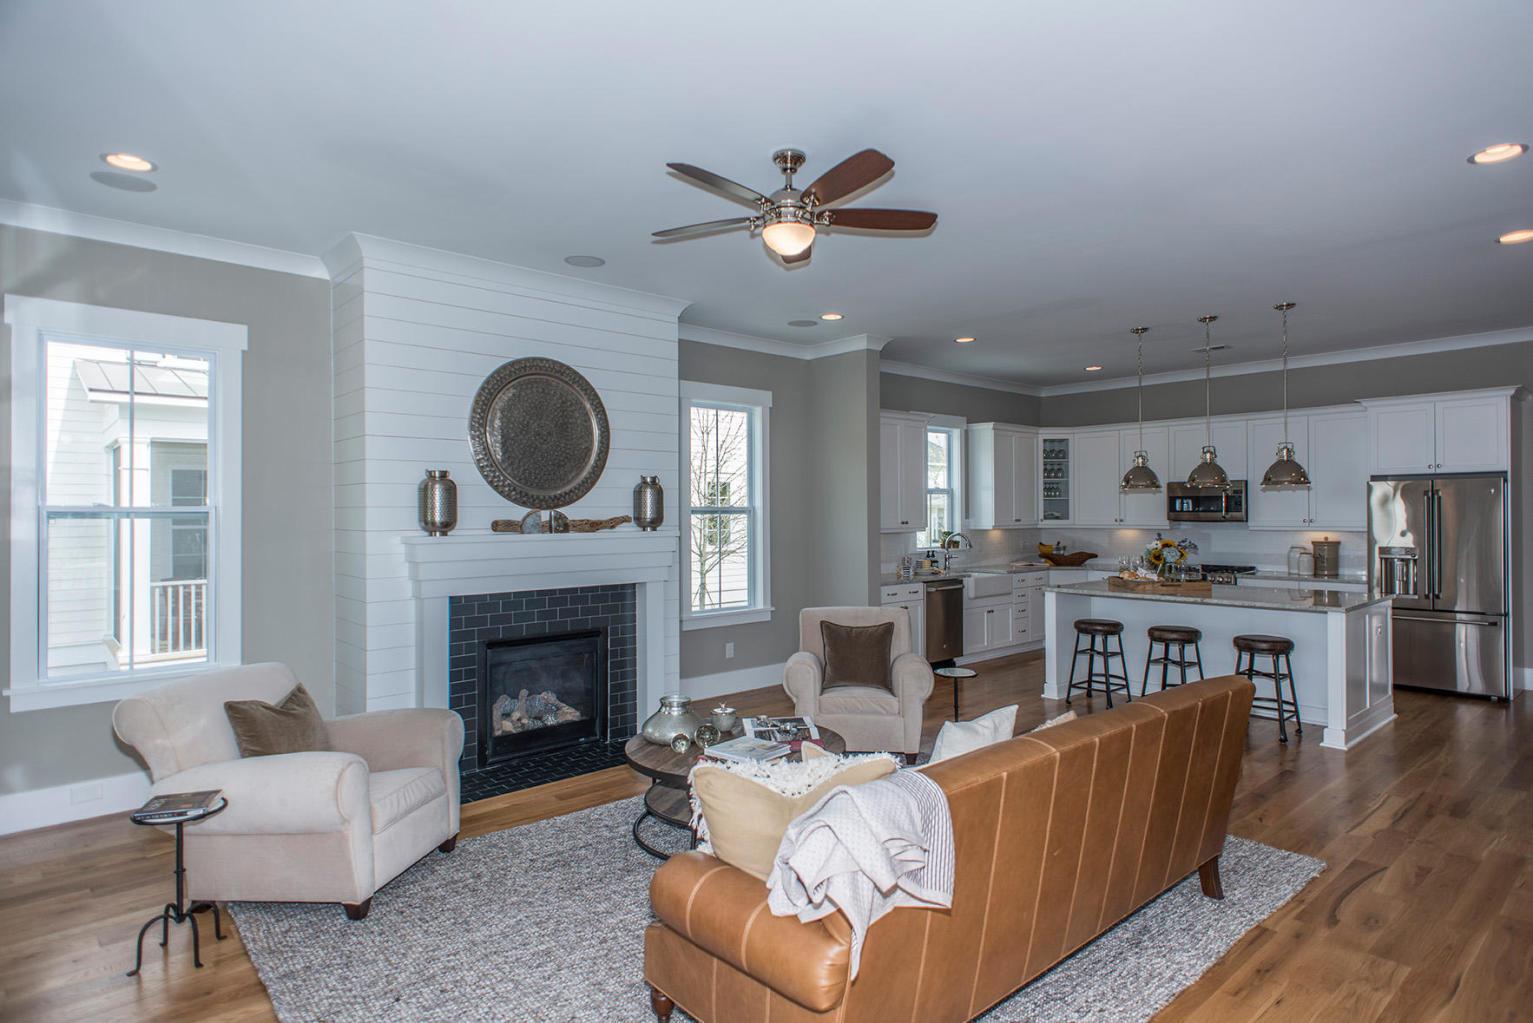 Carolina Park Homes For Sale - 1534 Banning, Mount Pleasant, SC - 14